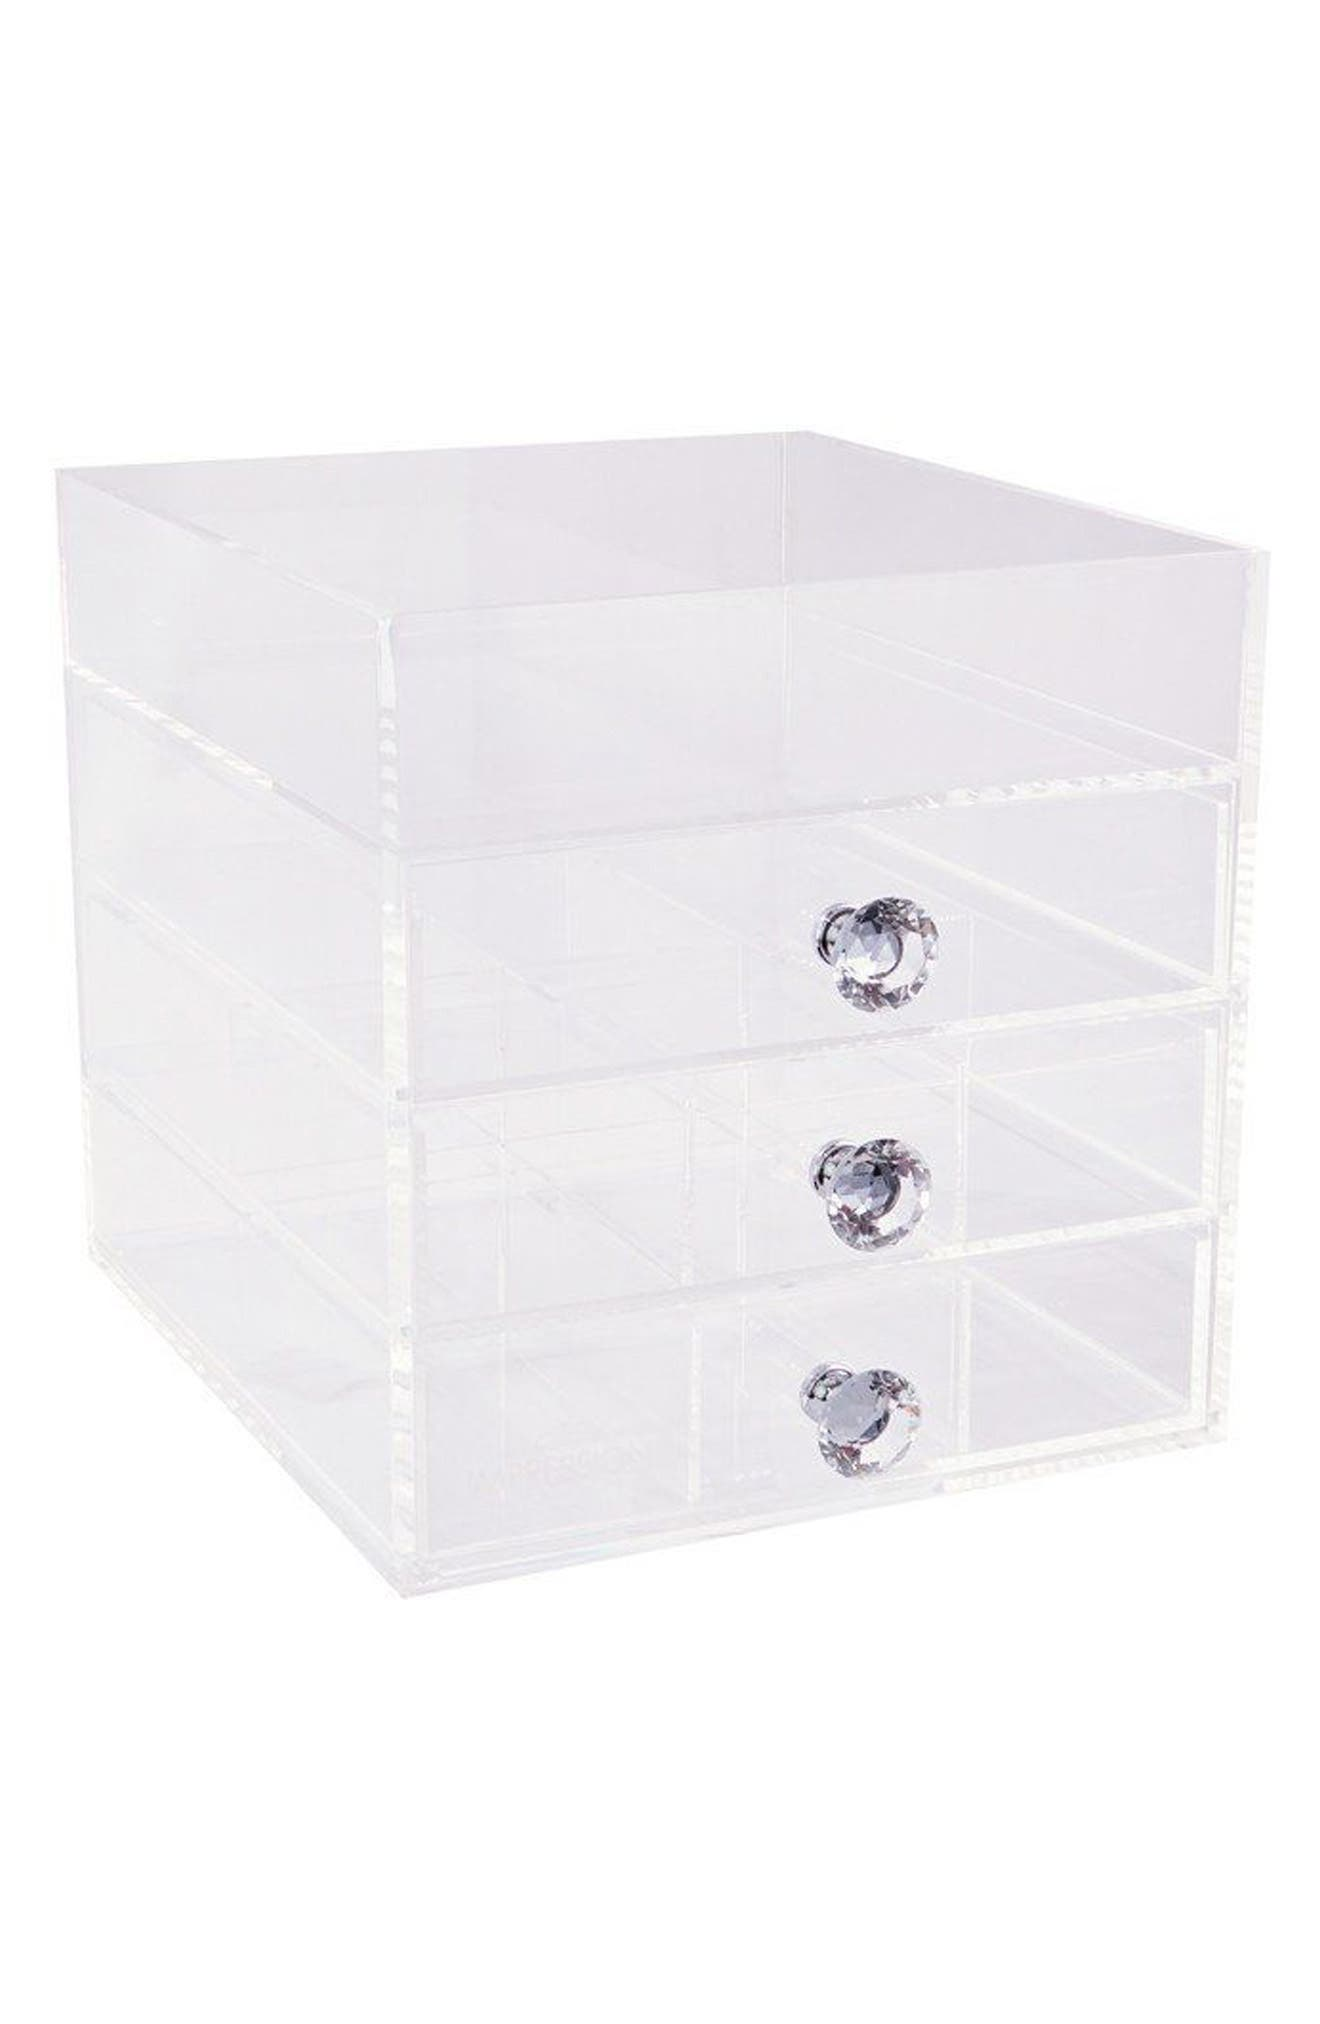 Impressions Vanity Co. Diamond Collection 4-Drawer Acrylic Organizer